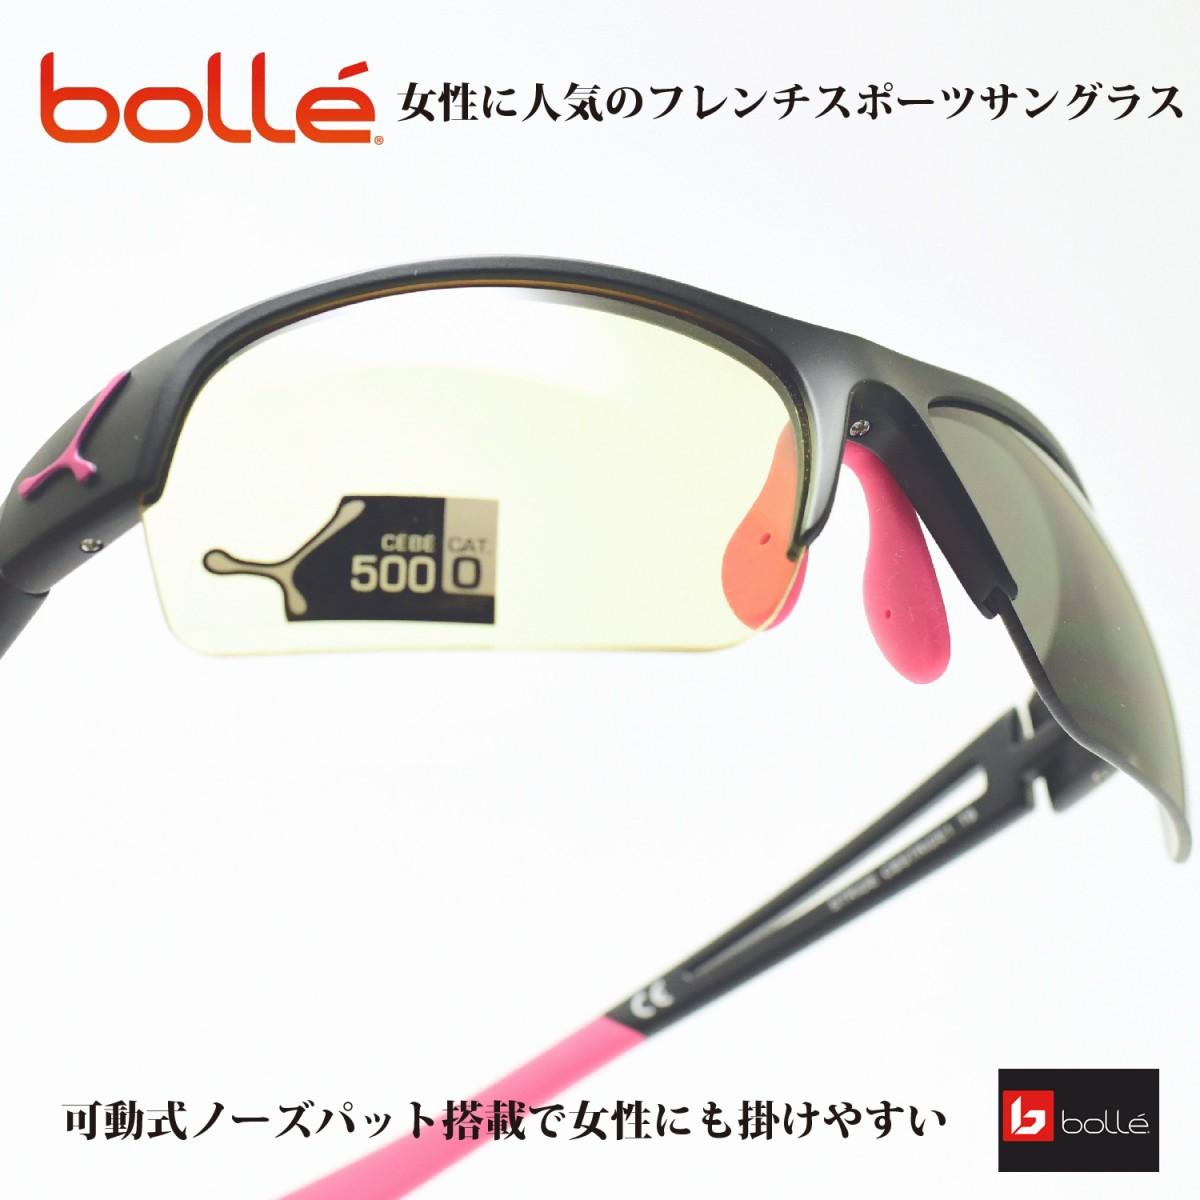 CEBE STRIDE セベ ストライドMAT BLACK MAGENTA/GREY&YELLOWメガネ 眼鏡 めがね メンズ レディース おしゃれ ブランド人気 おすすめ フレーム 流行り 度付き レンズ サングラス